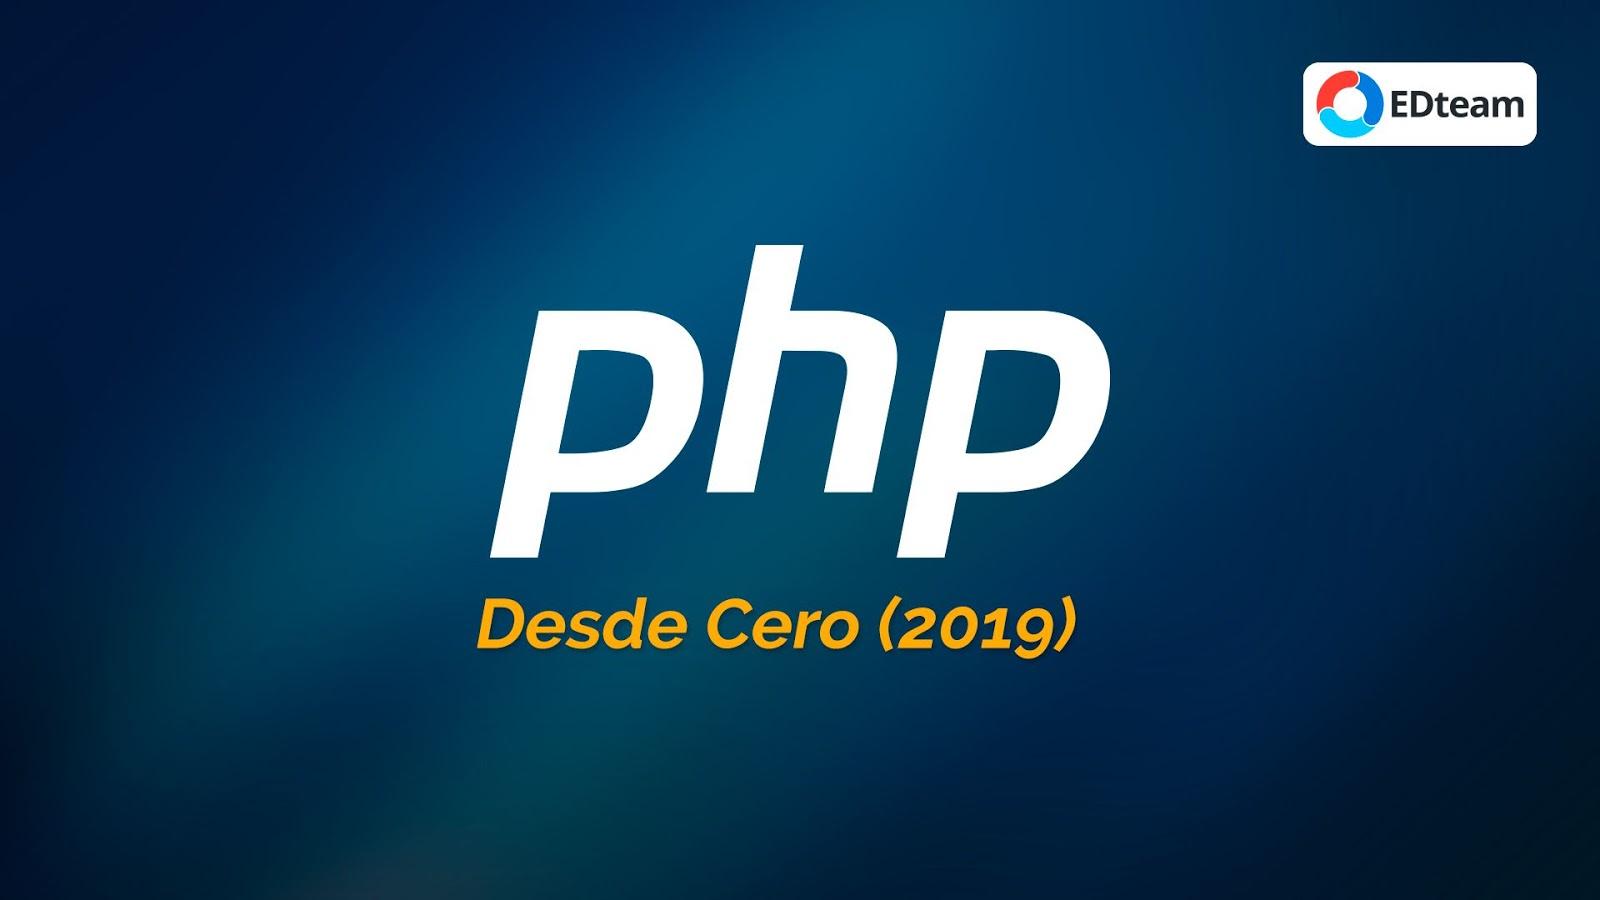 Curso PHP Desde Cero 2019 (EDTeam)